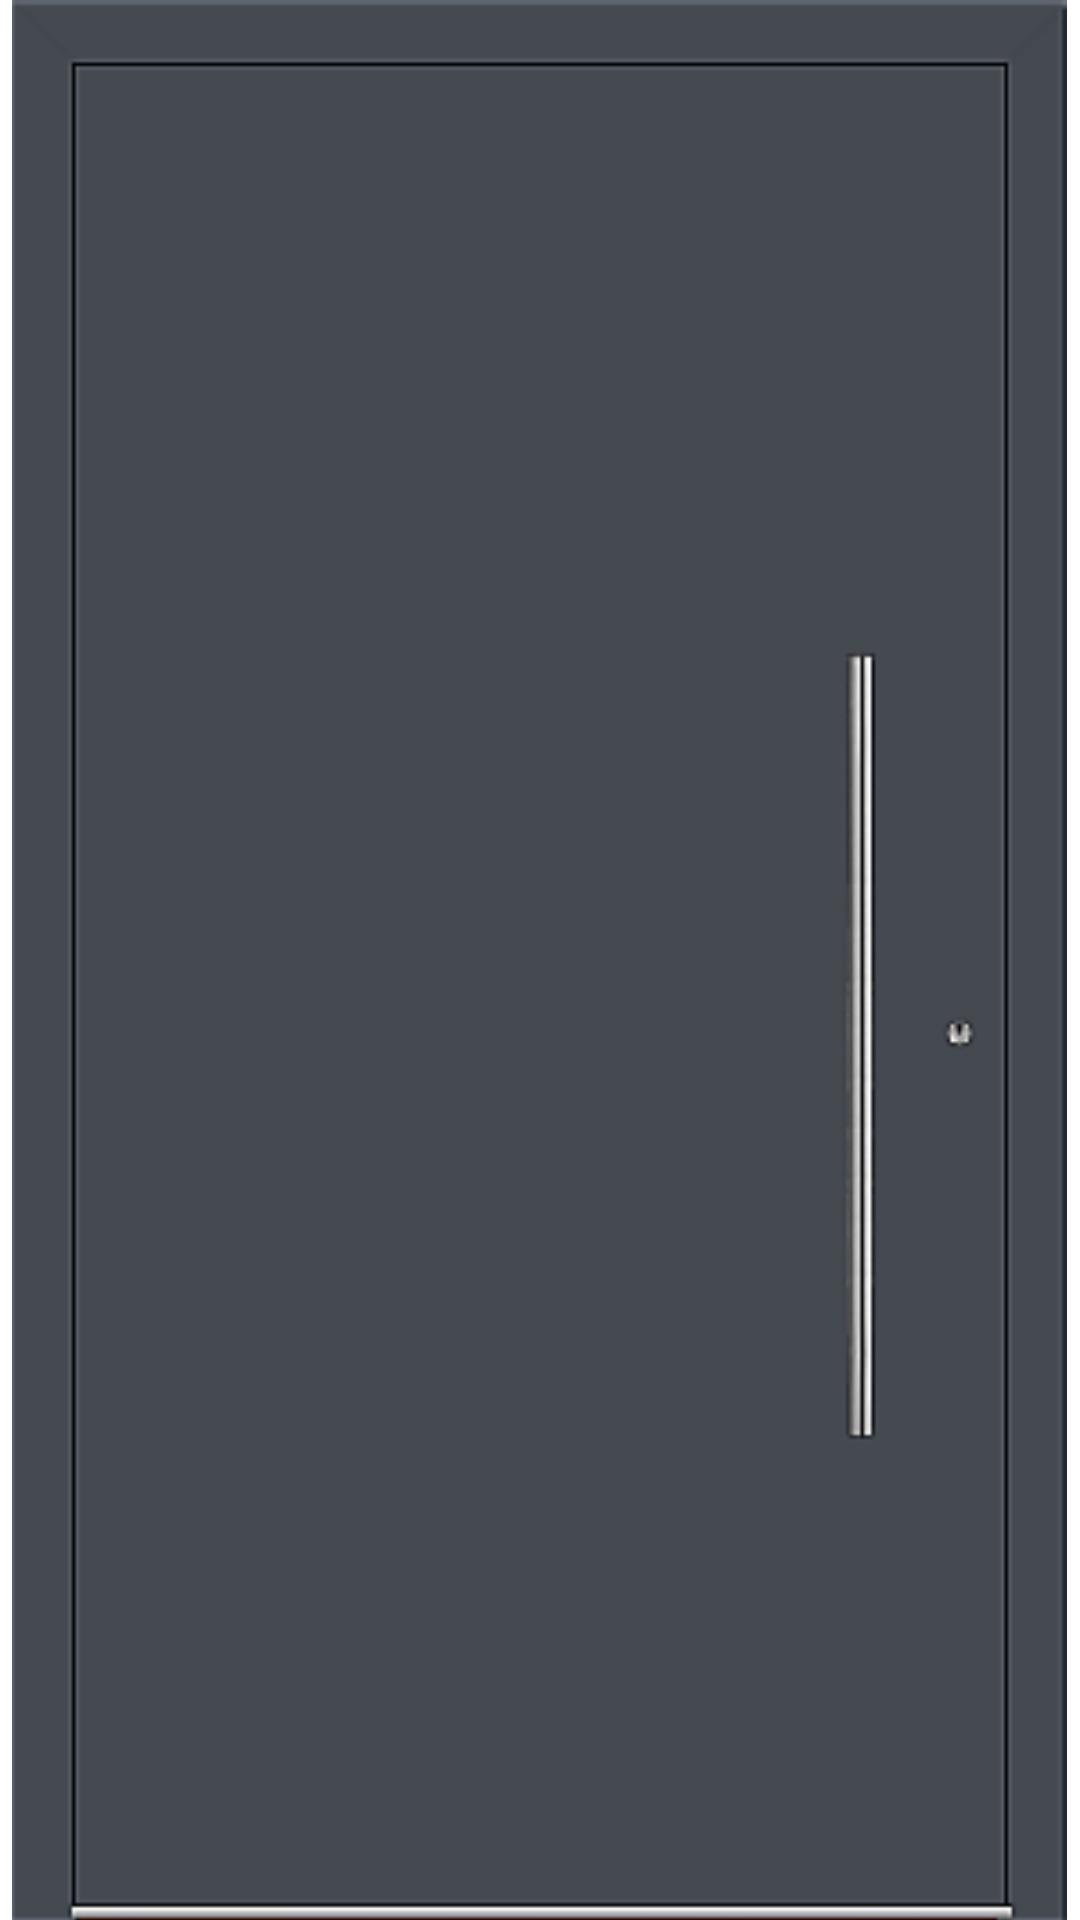 PaXentrée Aluminium Haustür M06001 graphitgrau